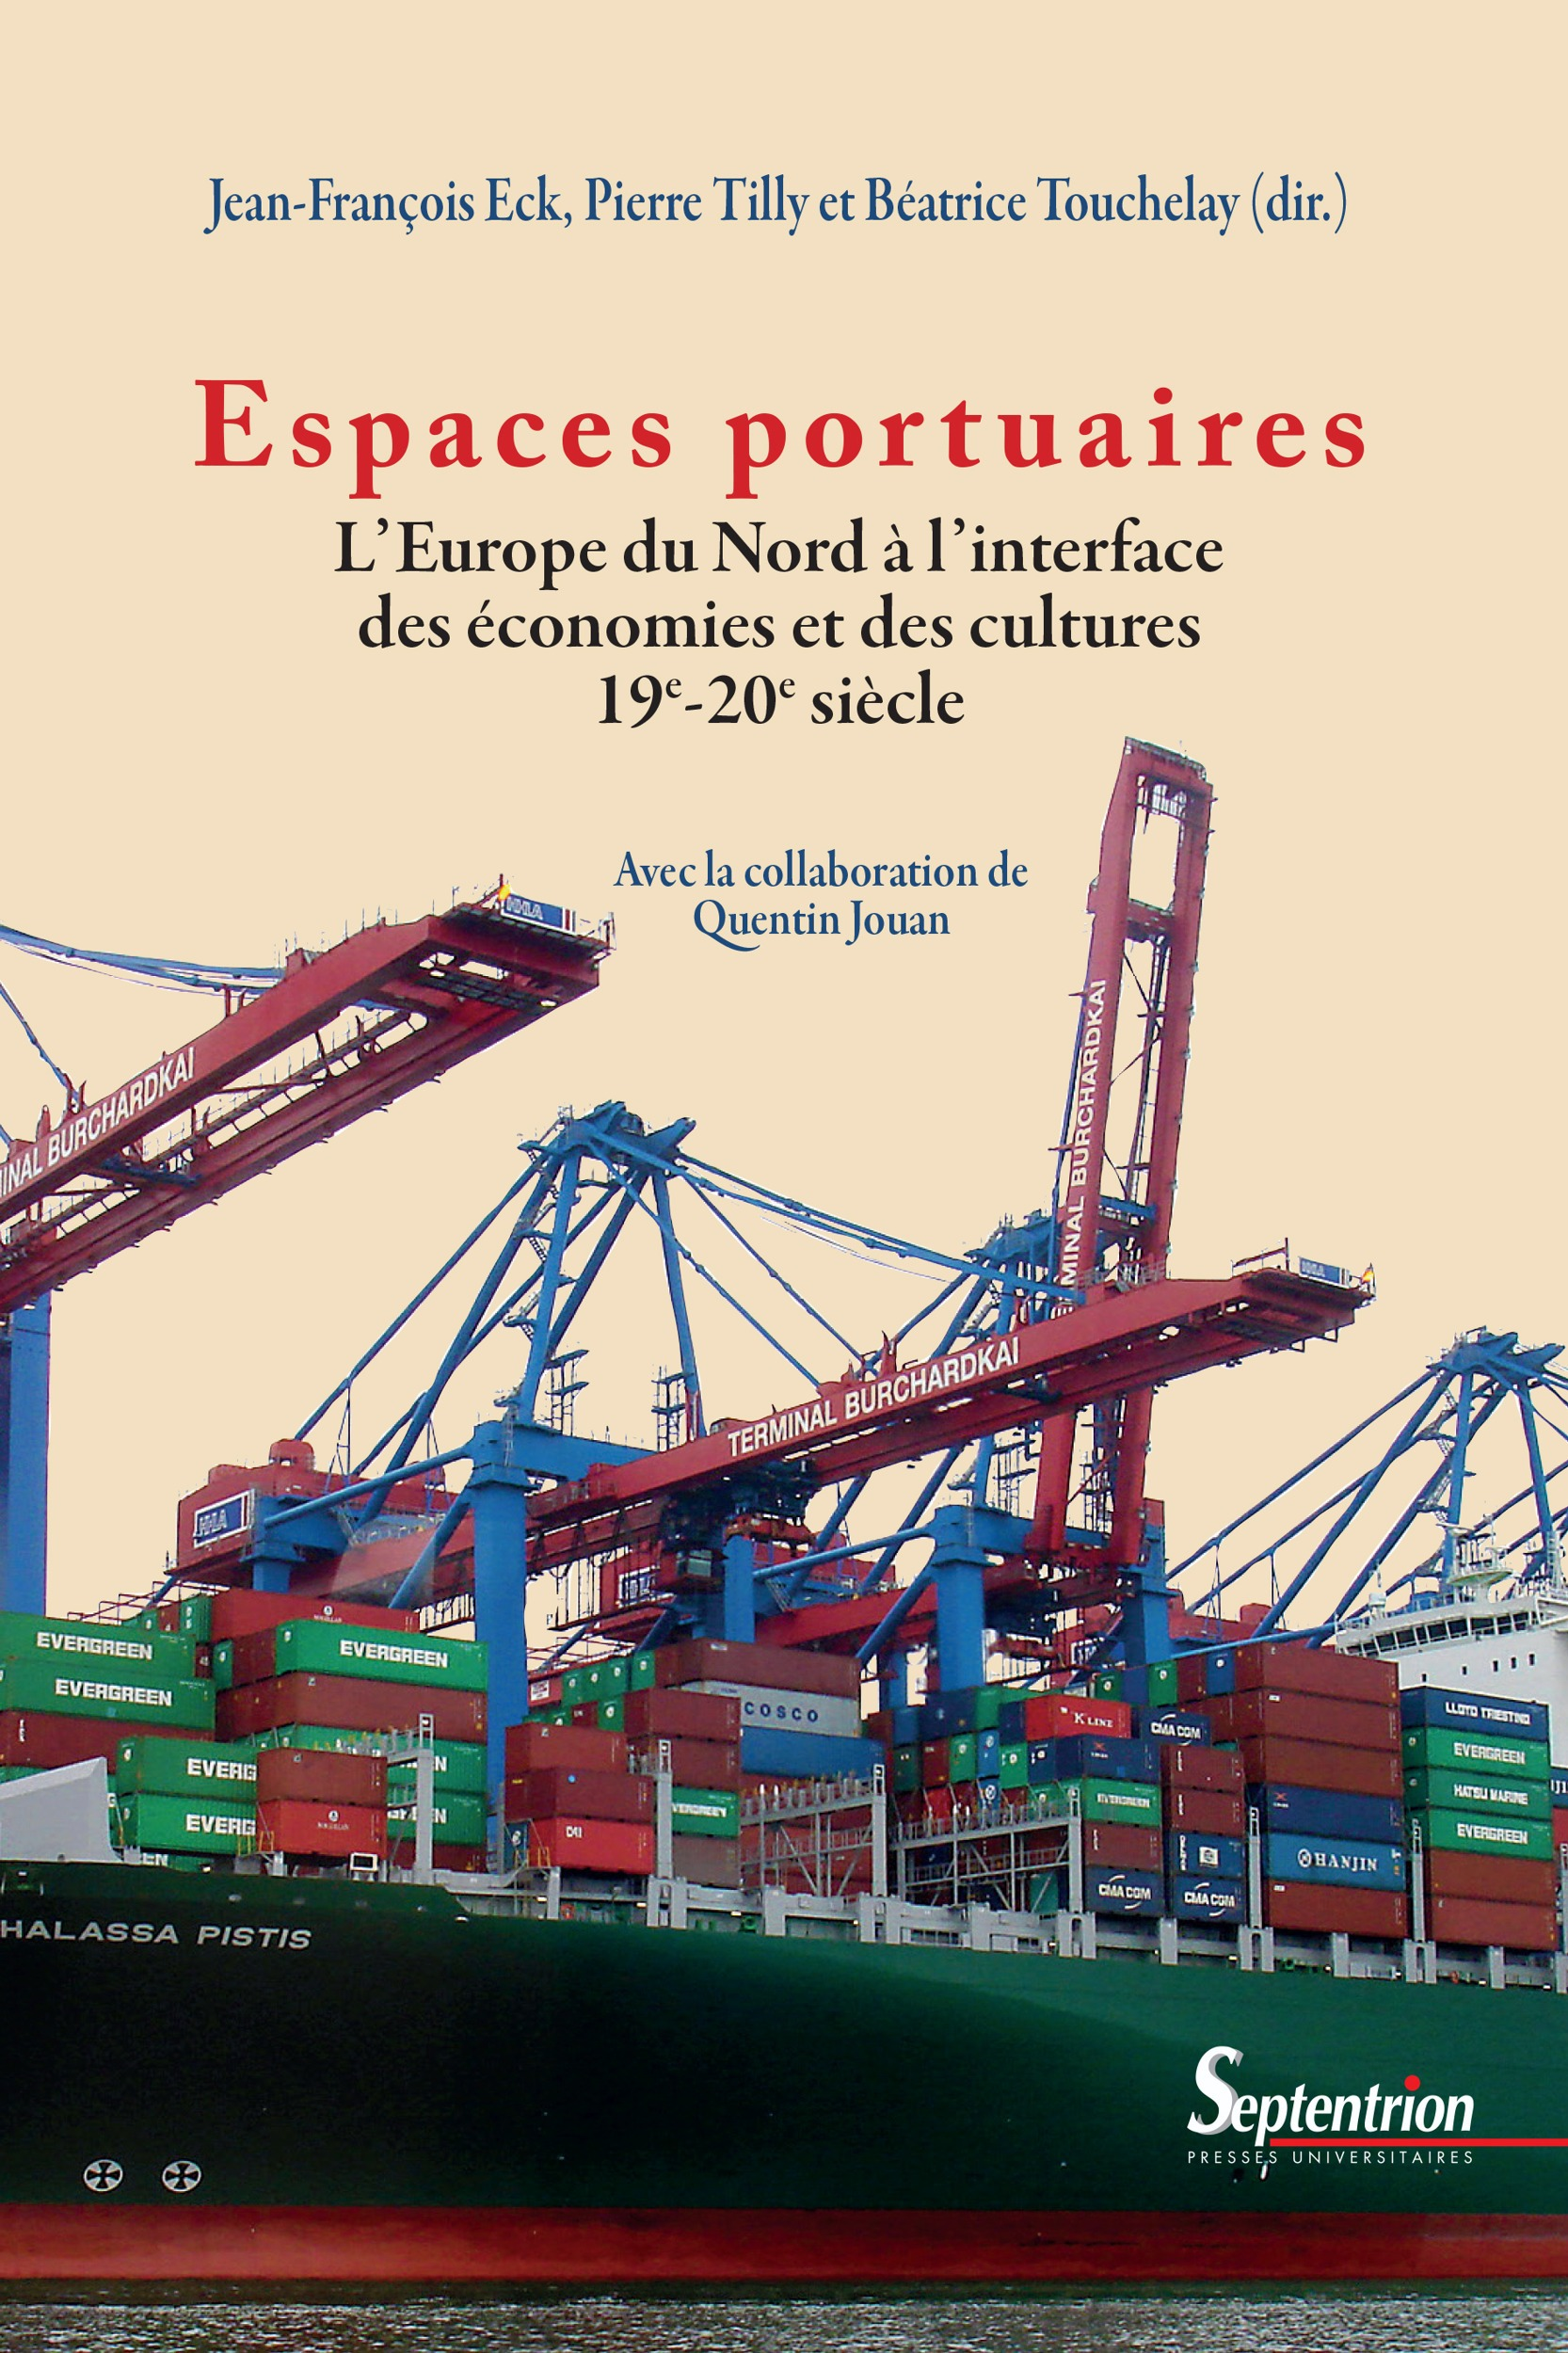 Espaces portuaires